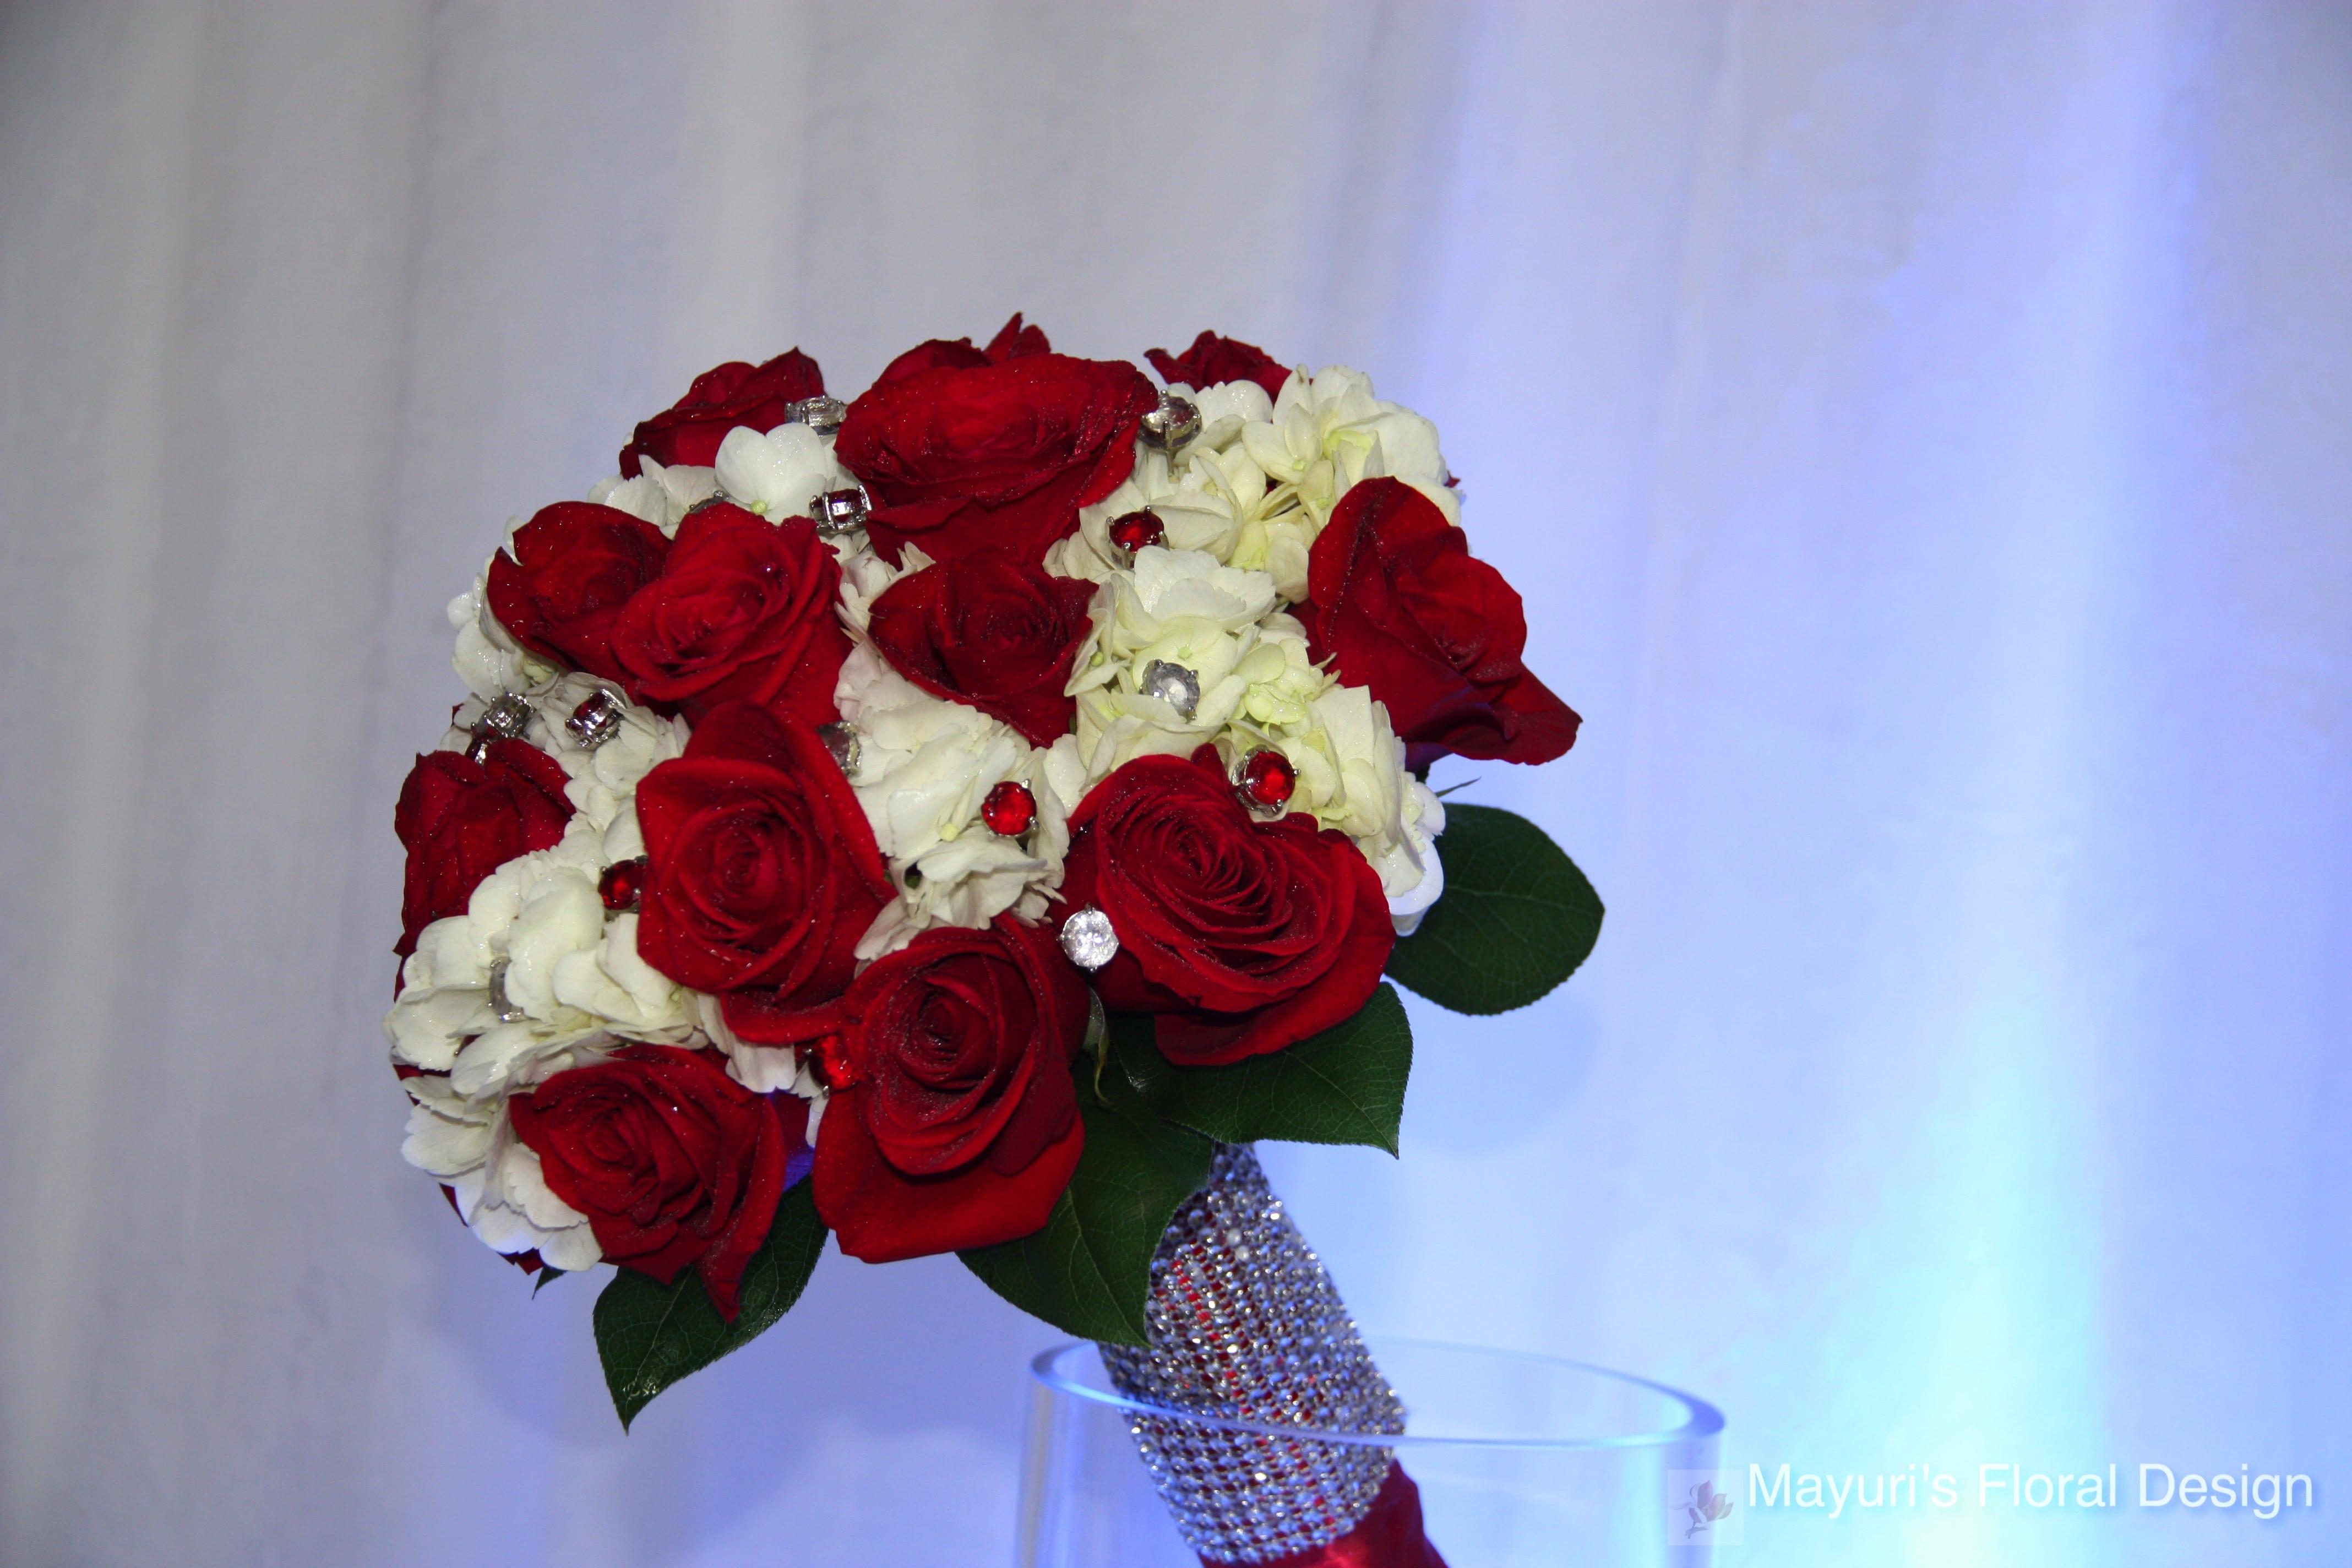 Mayuri S Floral Design 34 Events By Mayuri